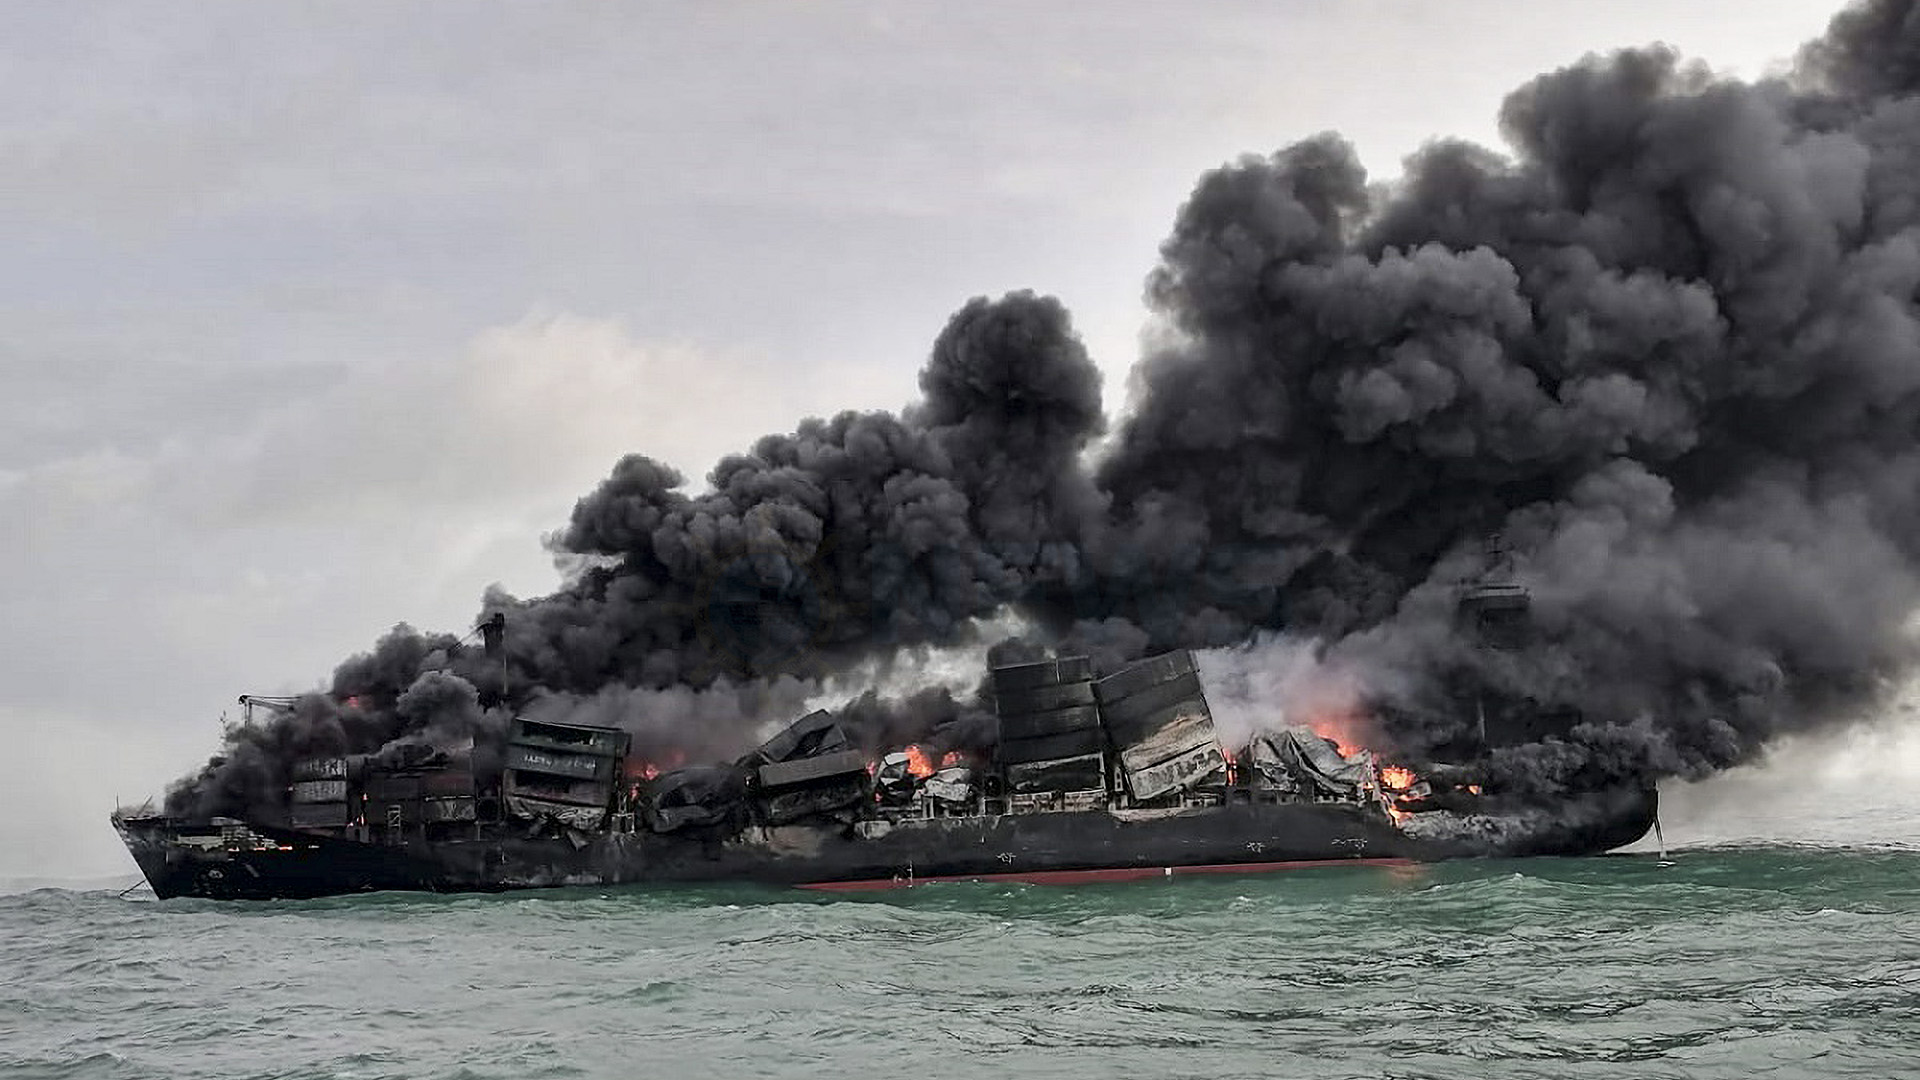 PHOTOS: Mystery Fire Sinks Toxic Cargo Ship, Risking Marine Life In Sri Lanka